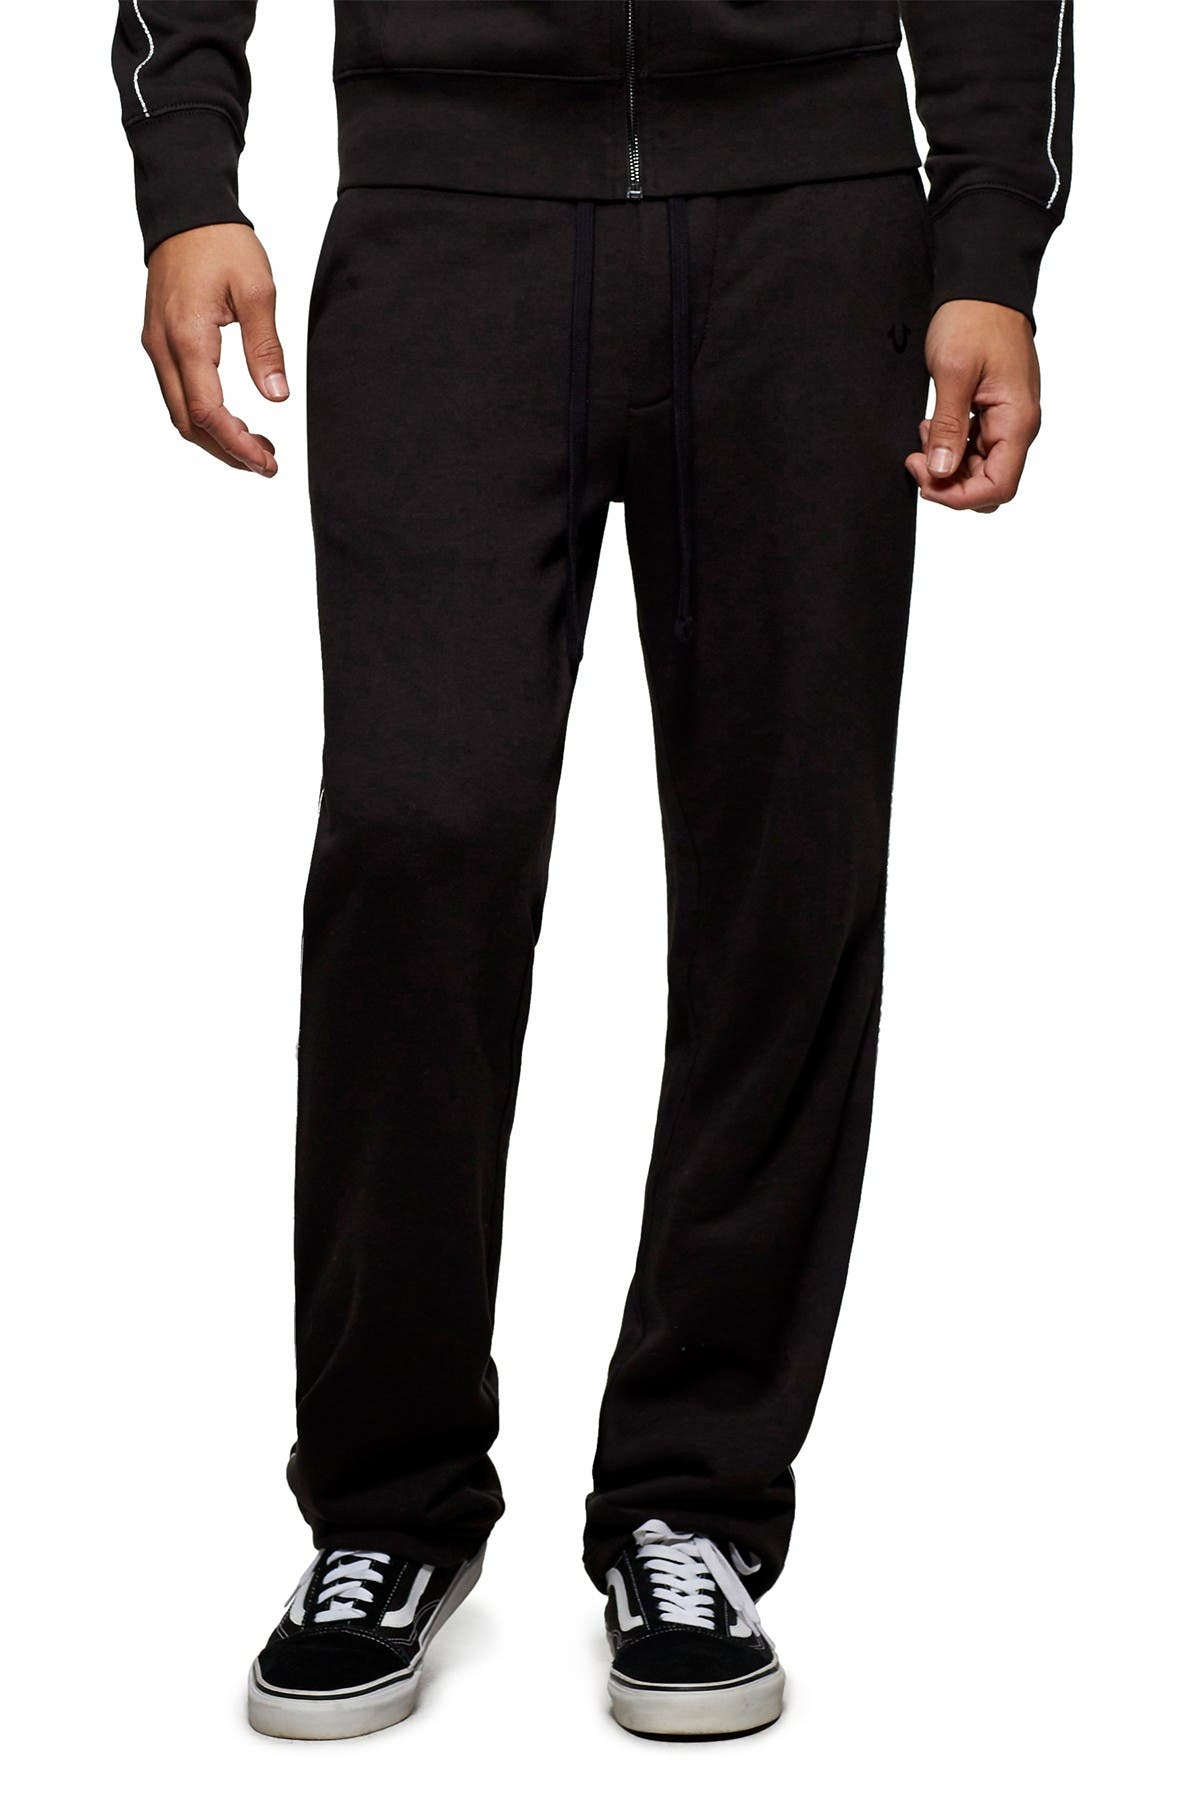 Image of True Religion Metallic Side Sweatpants